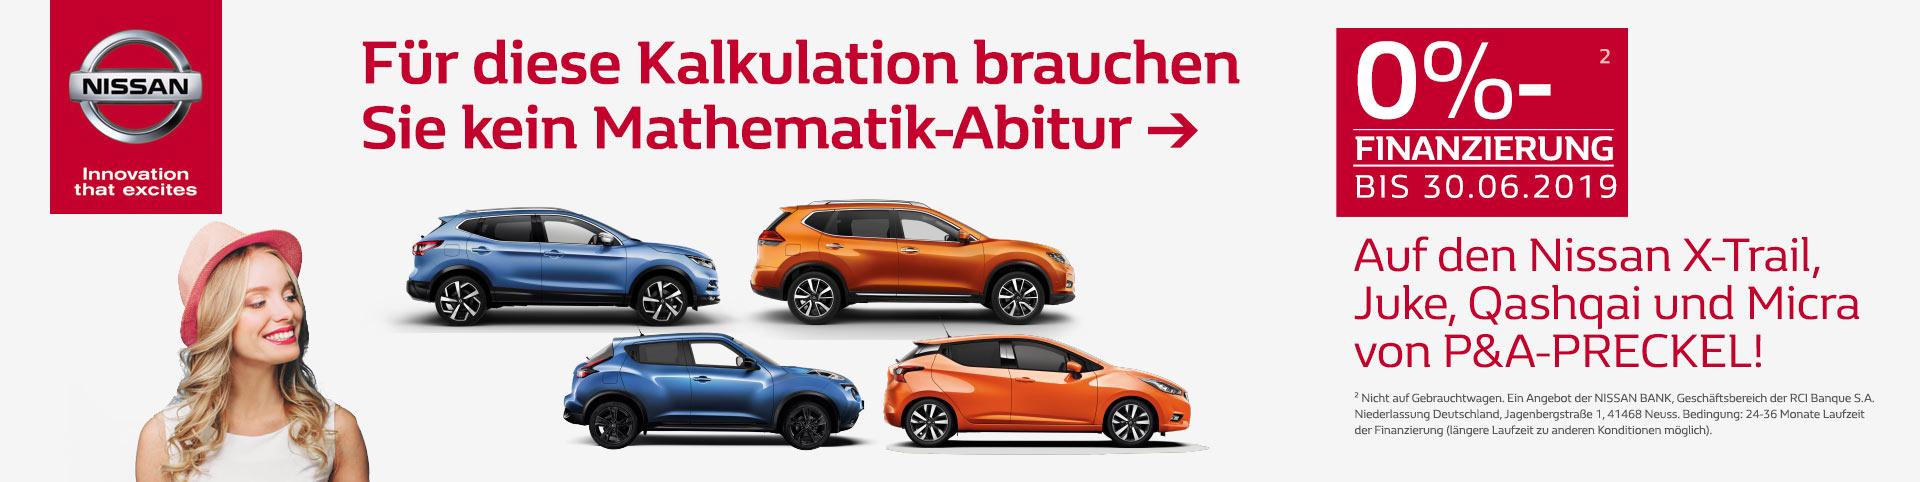 0% Finanzierung bei Nissan Juke, Qashqai, Micra, X-Trail